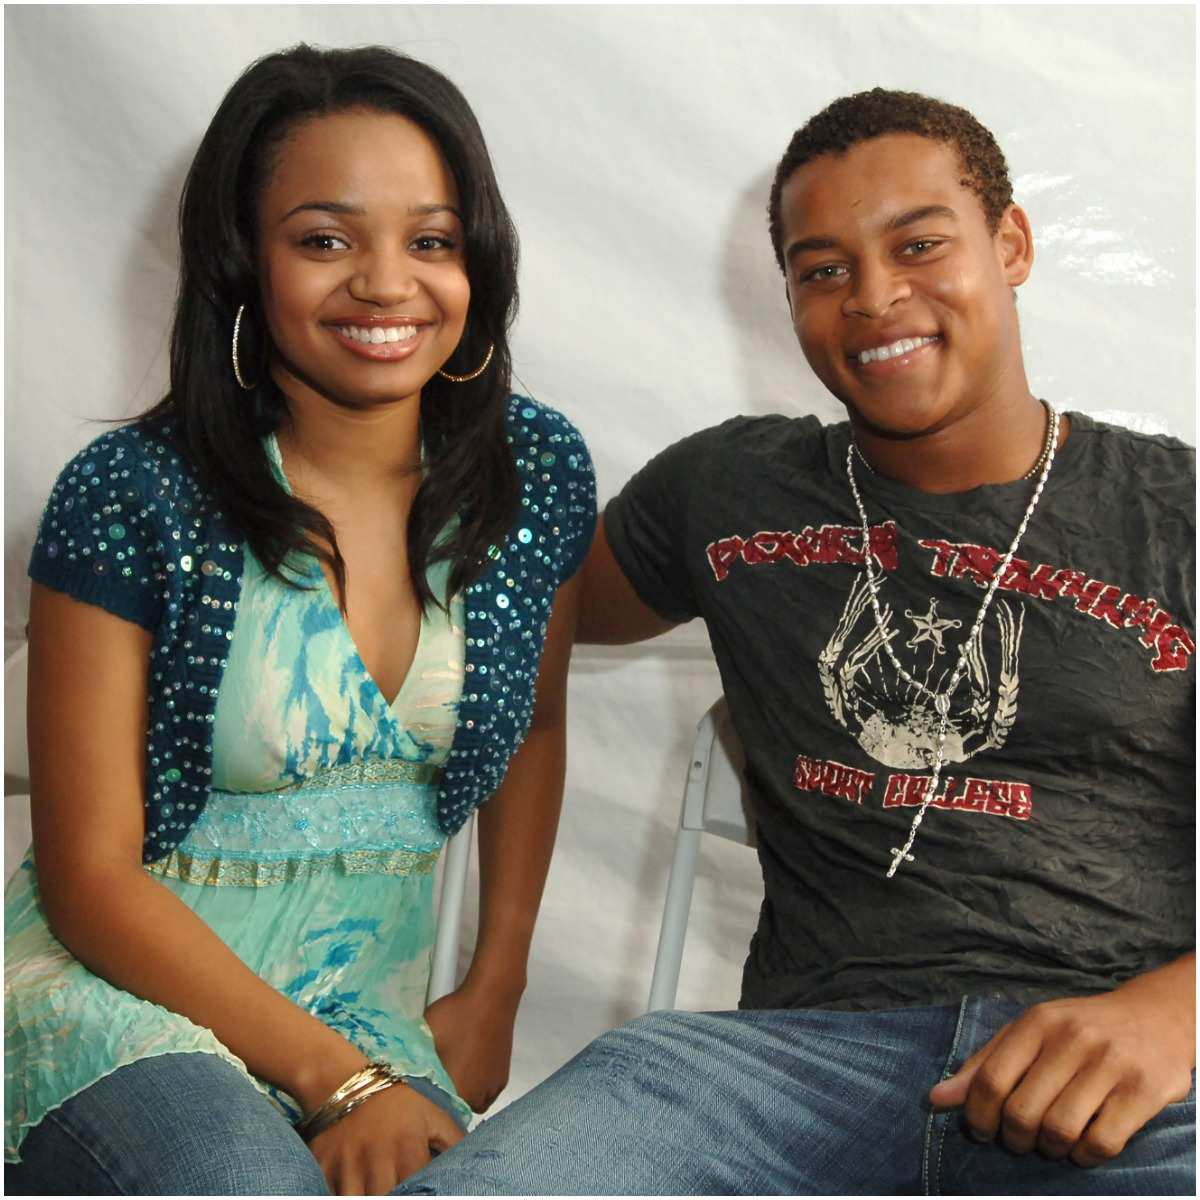 Robert Ri'chard and his girlfriend Kyla Pratt